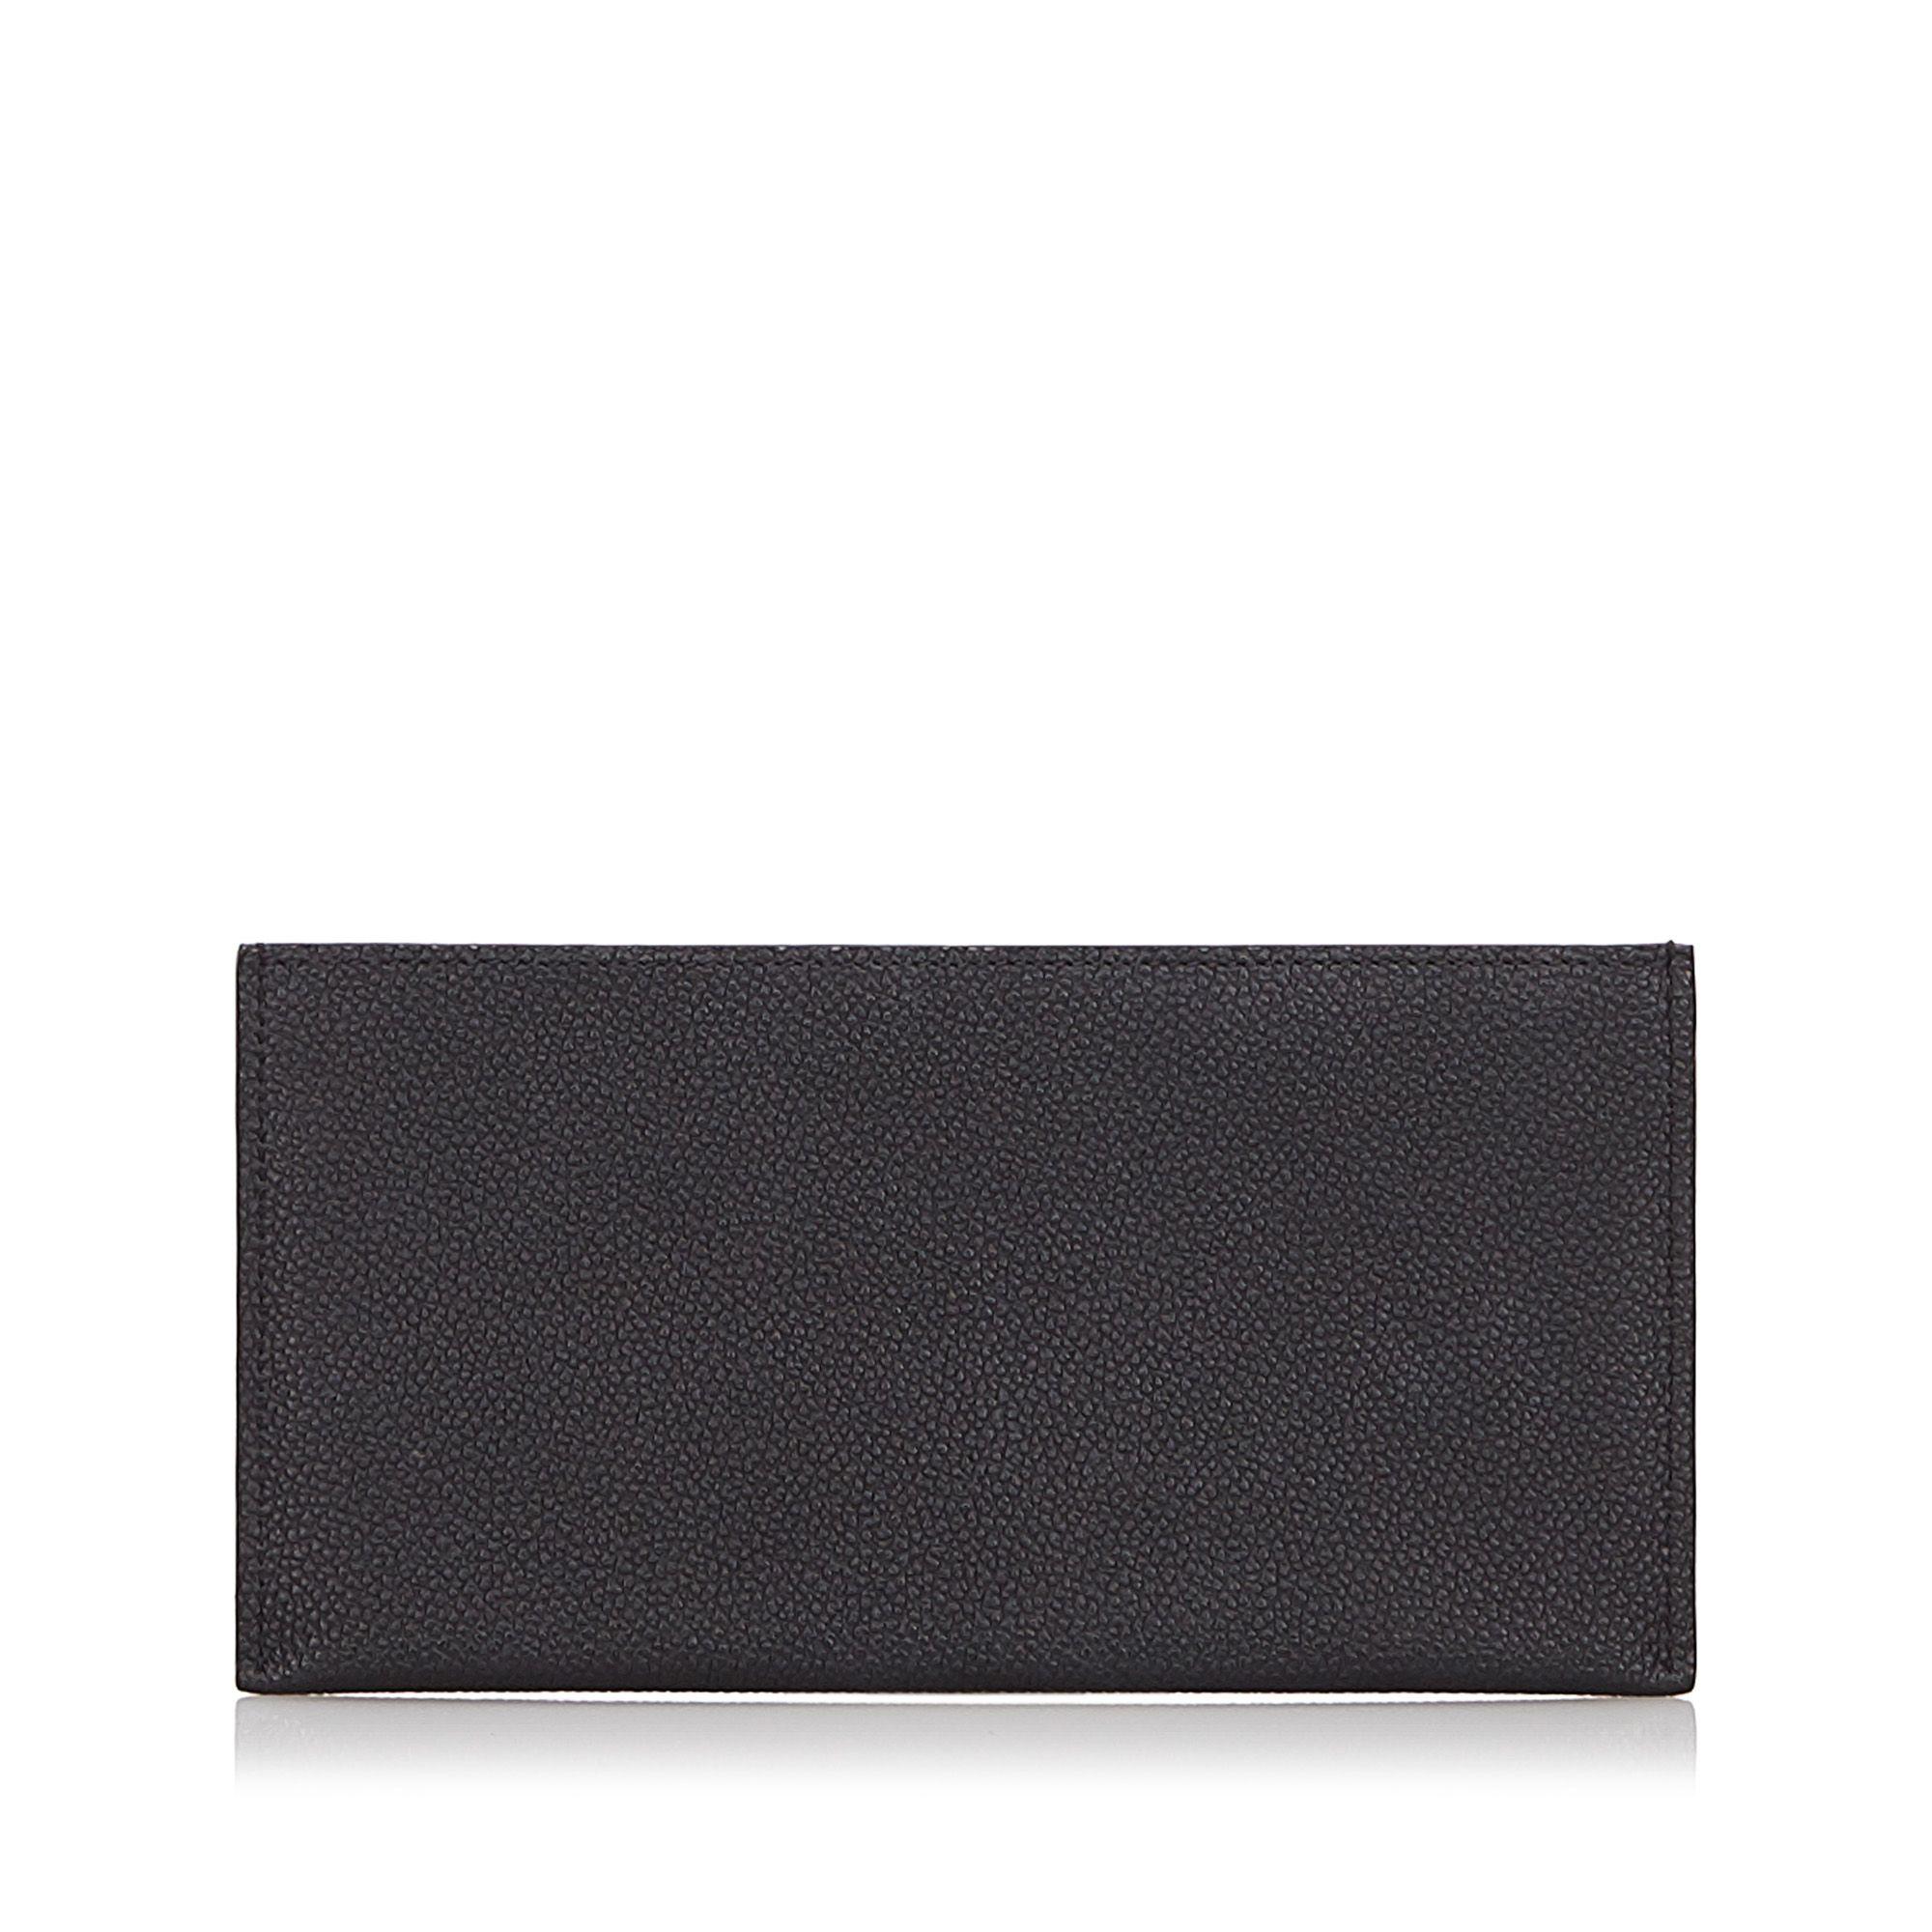 Vintage Louis Vuitton Taiga Pochette Felicie Insert Black